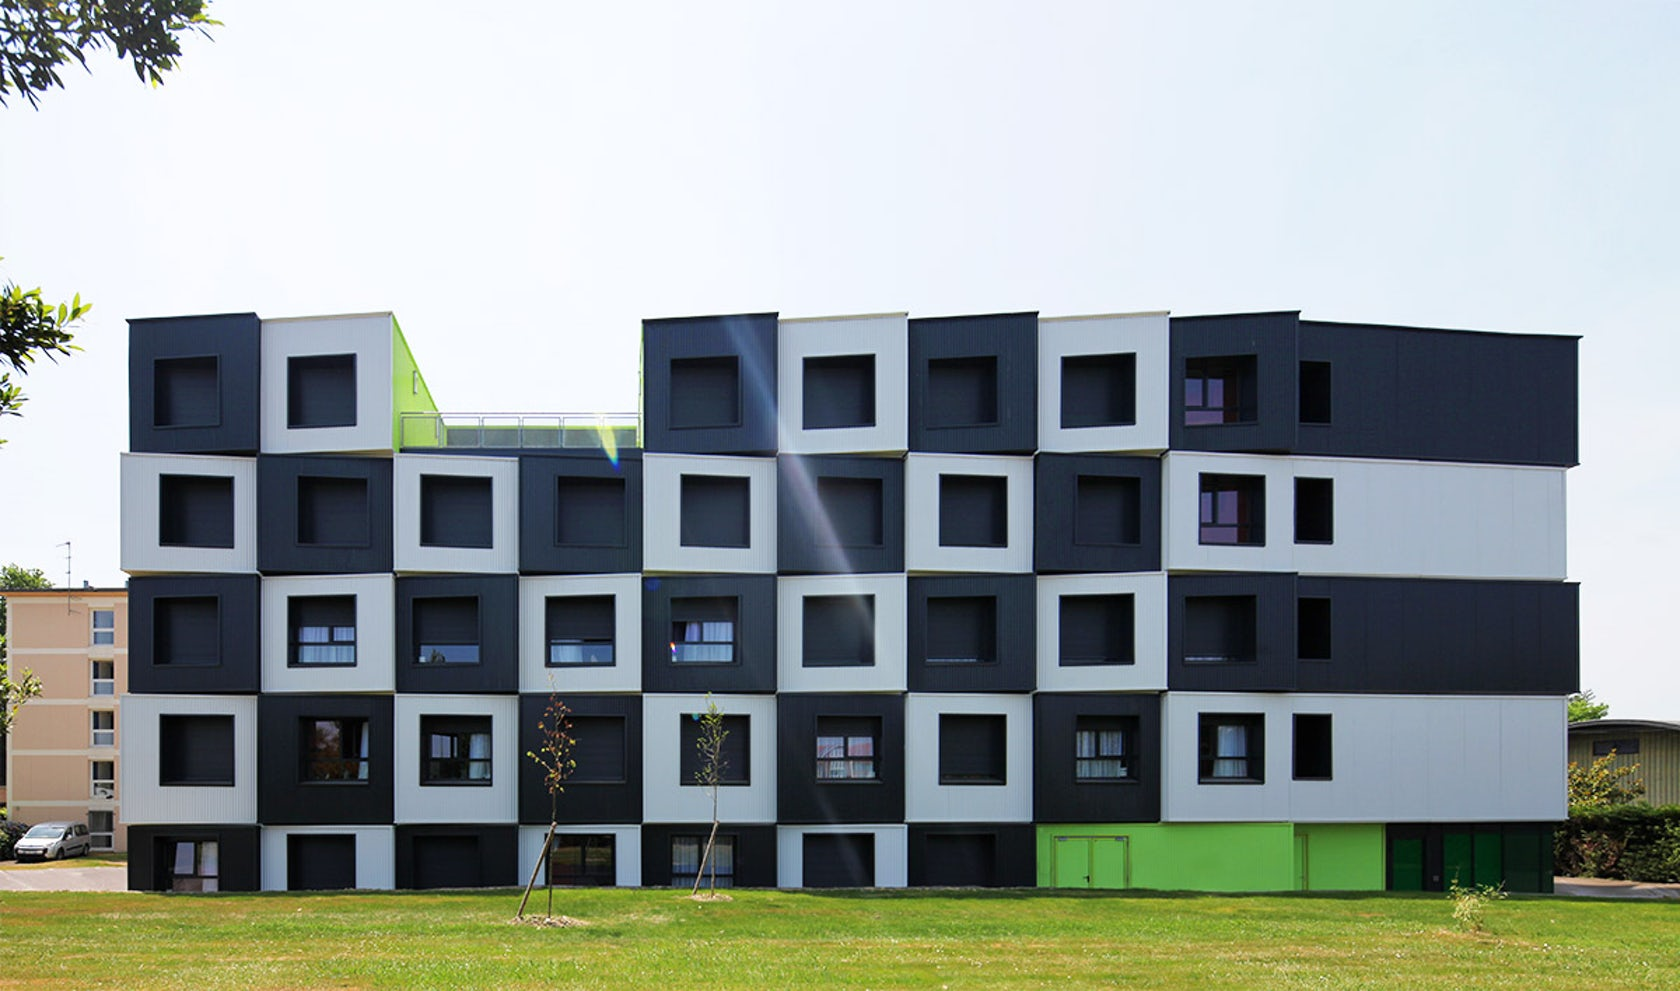 The Modular Checkerboard A Student Housing Development In